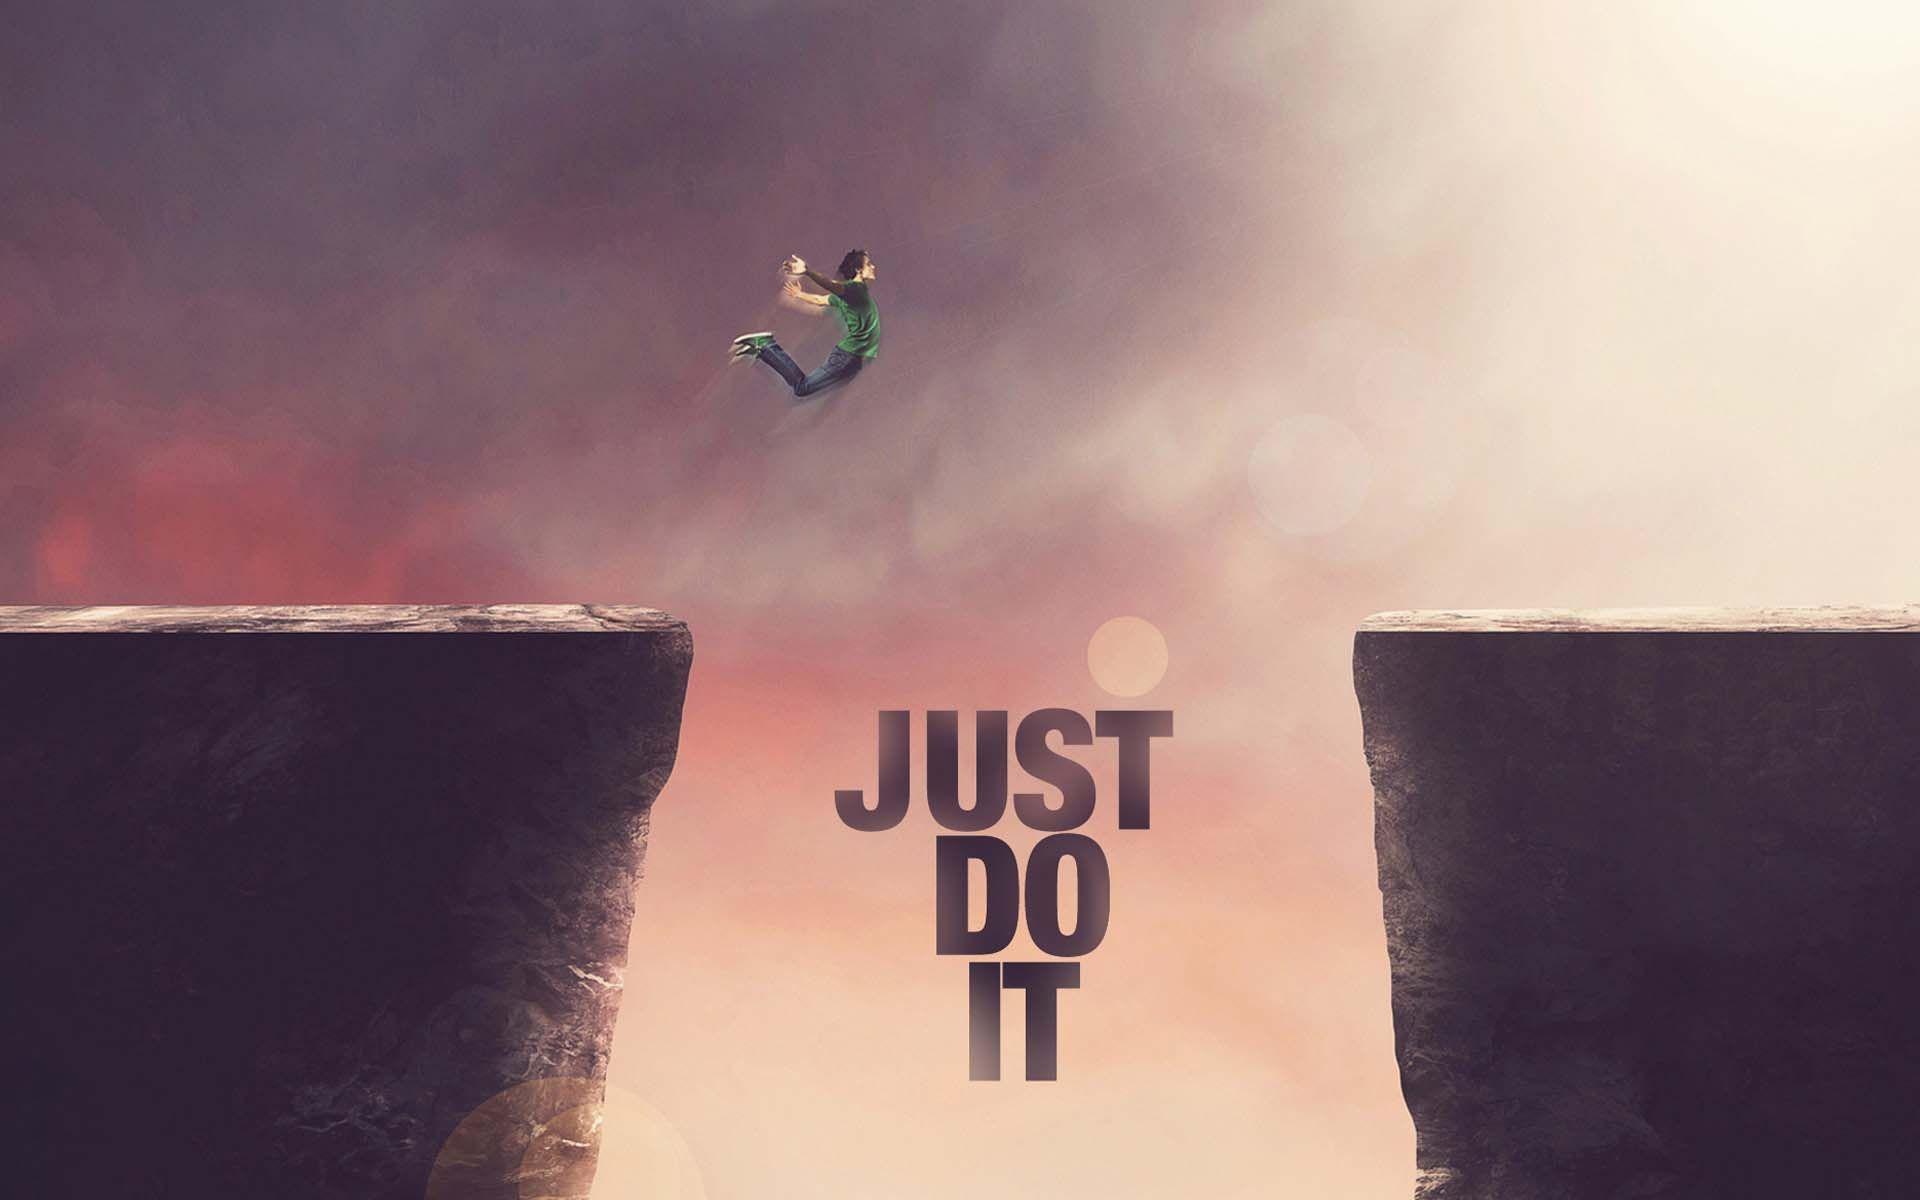 Nike Motivational Quotes Iphone Wallpaper Motivational Wallpaper Study Pixelstalk Net